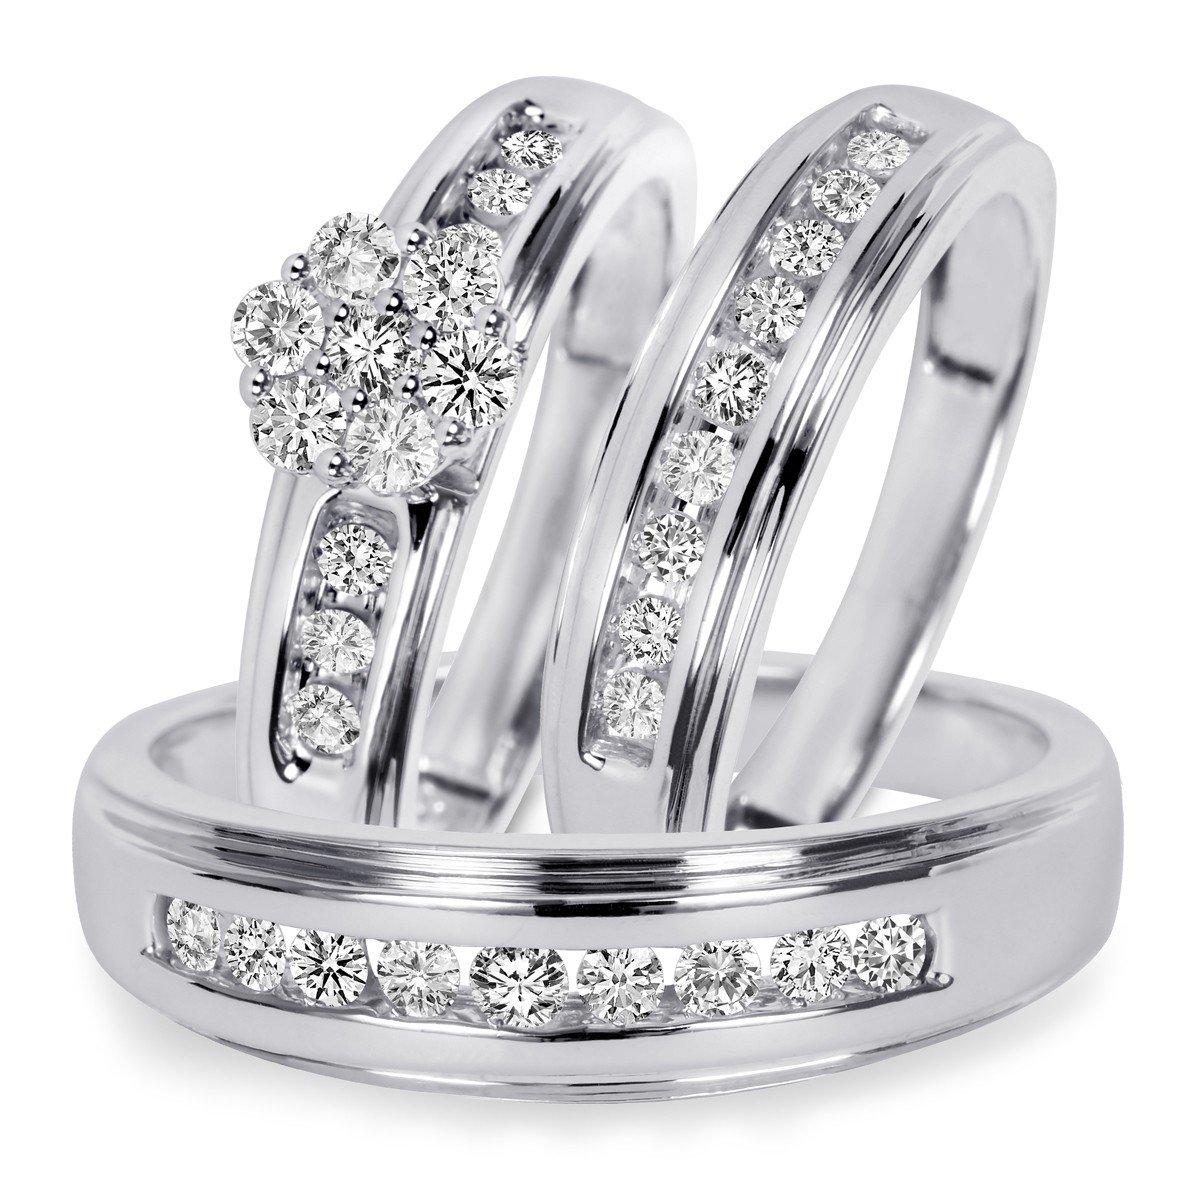 Silvernshine Jewels 3/4 Ct D/VVS1 Diamond Men's & Women's Engagement Ring Trio Set 14K White Gold Fn by Silvernshine Jewels